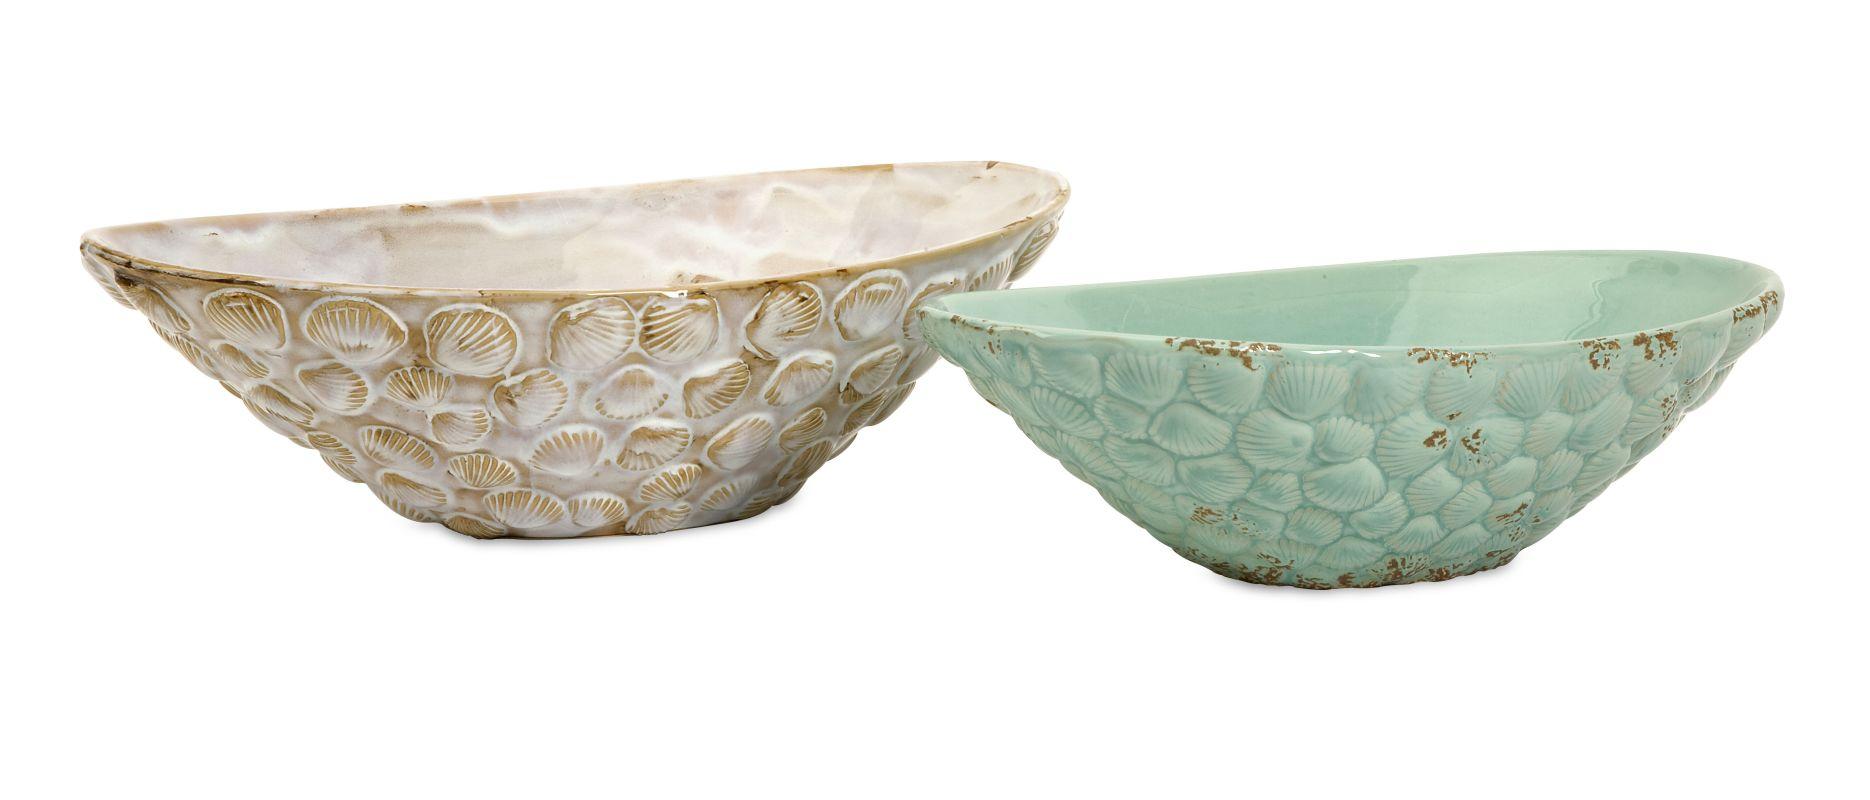 IMAX Home 69257-2 Seashell Serving Bowls - Set of 2 Home Decor